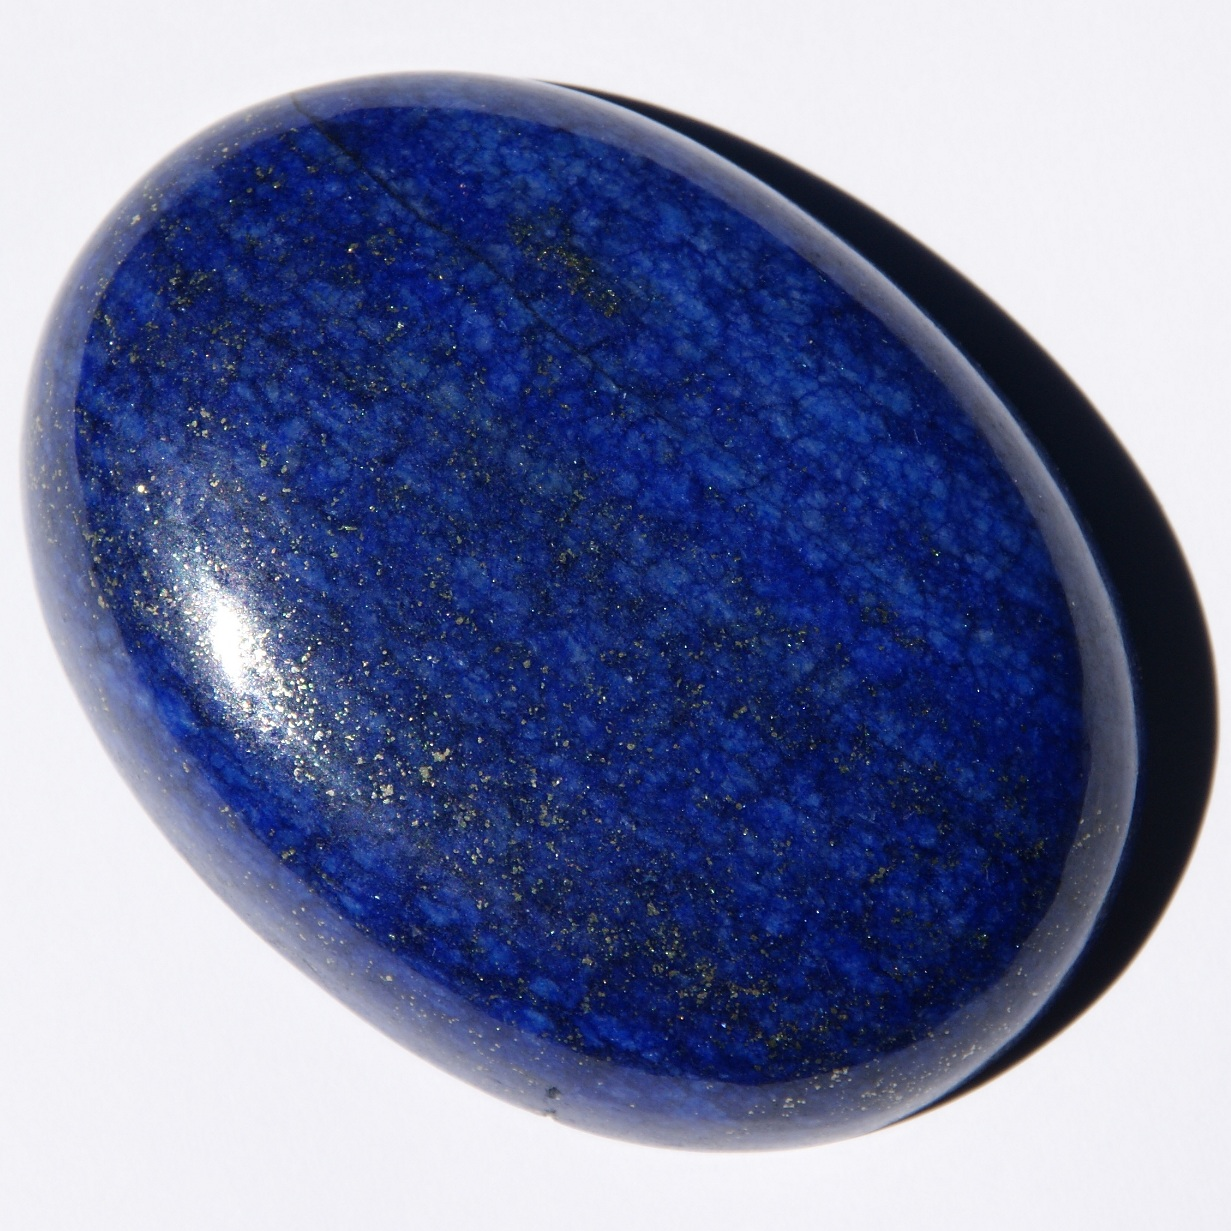 Is Lapis Lazuli Gourd Natural Stone